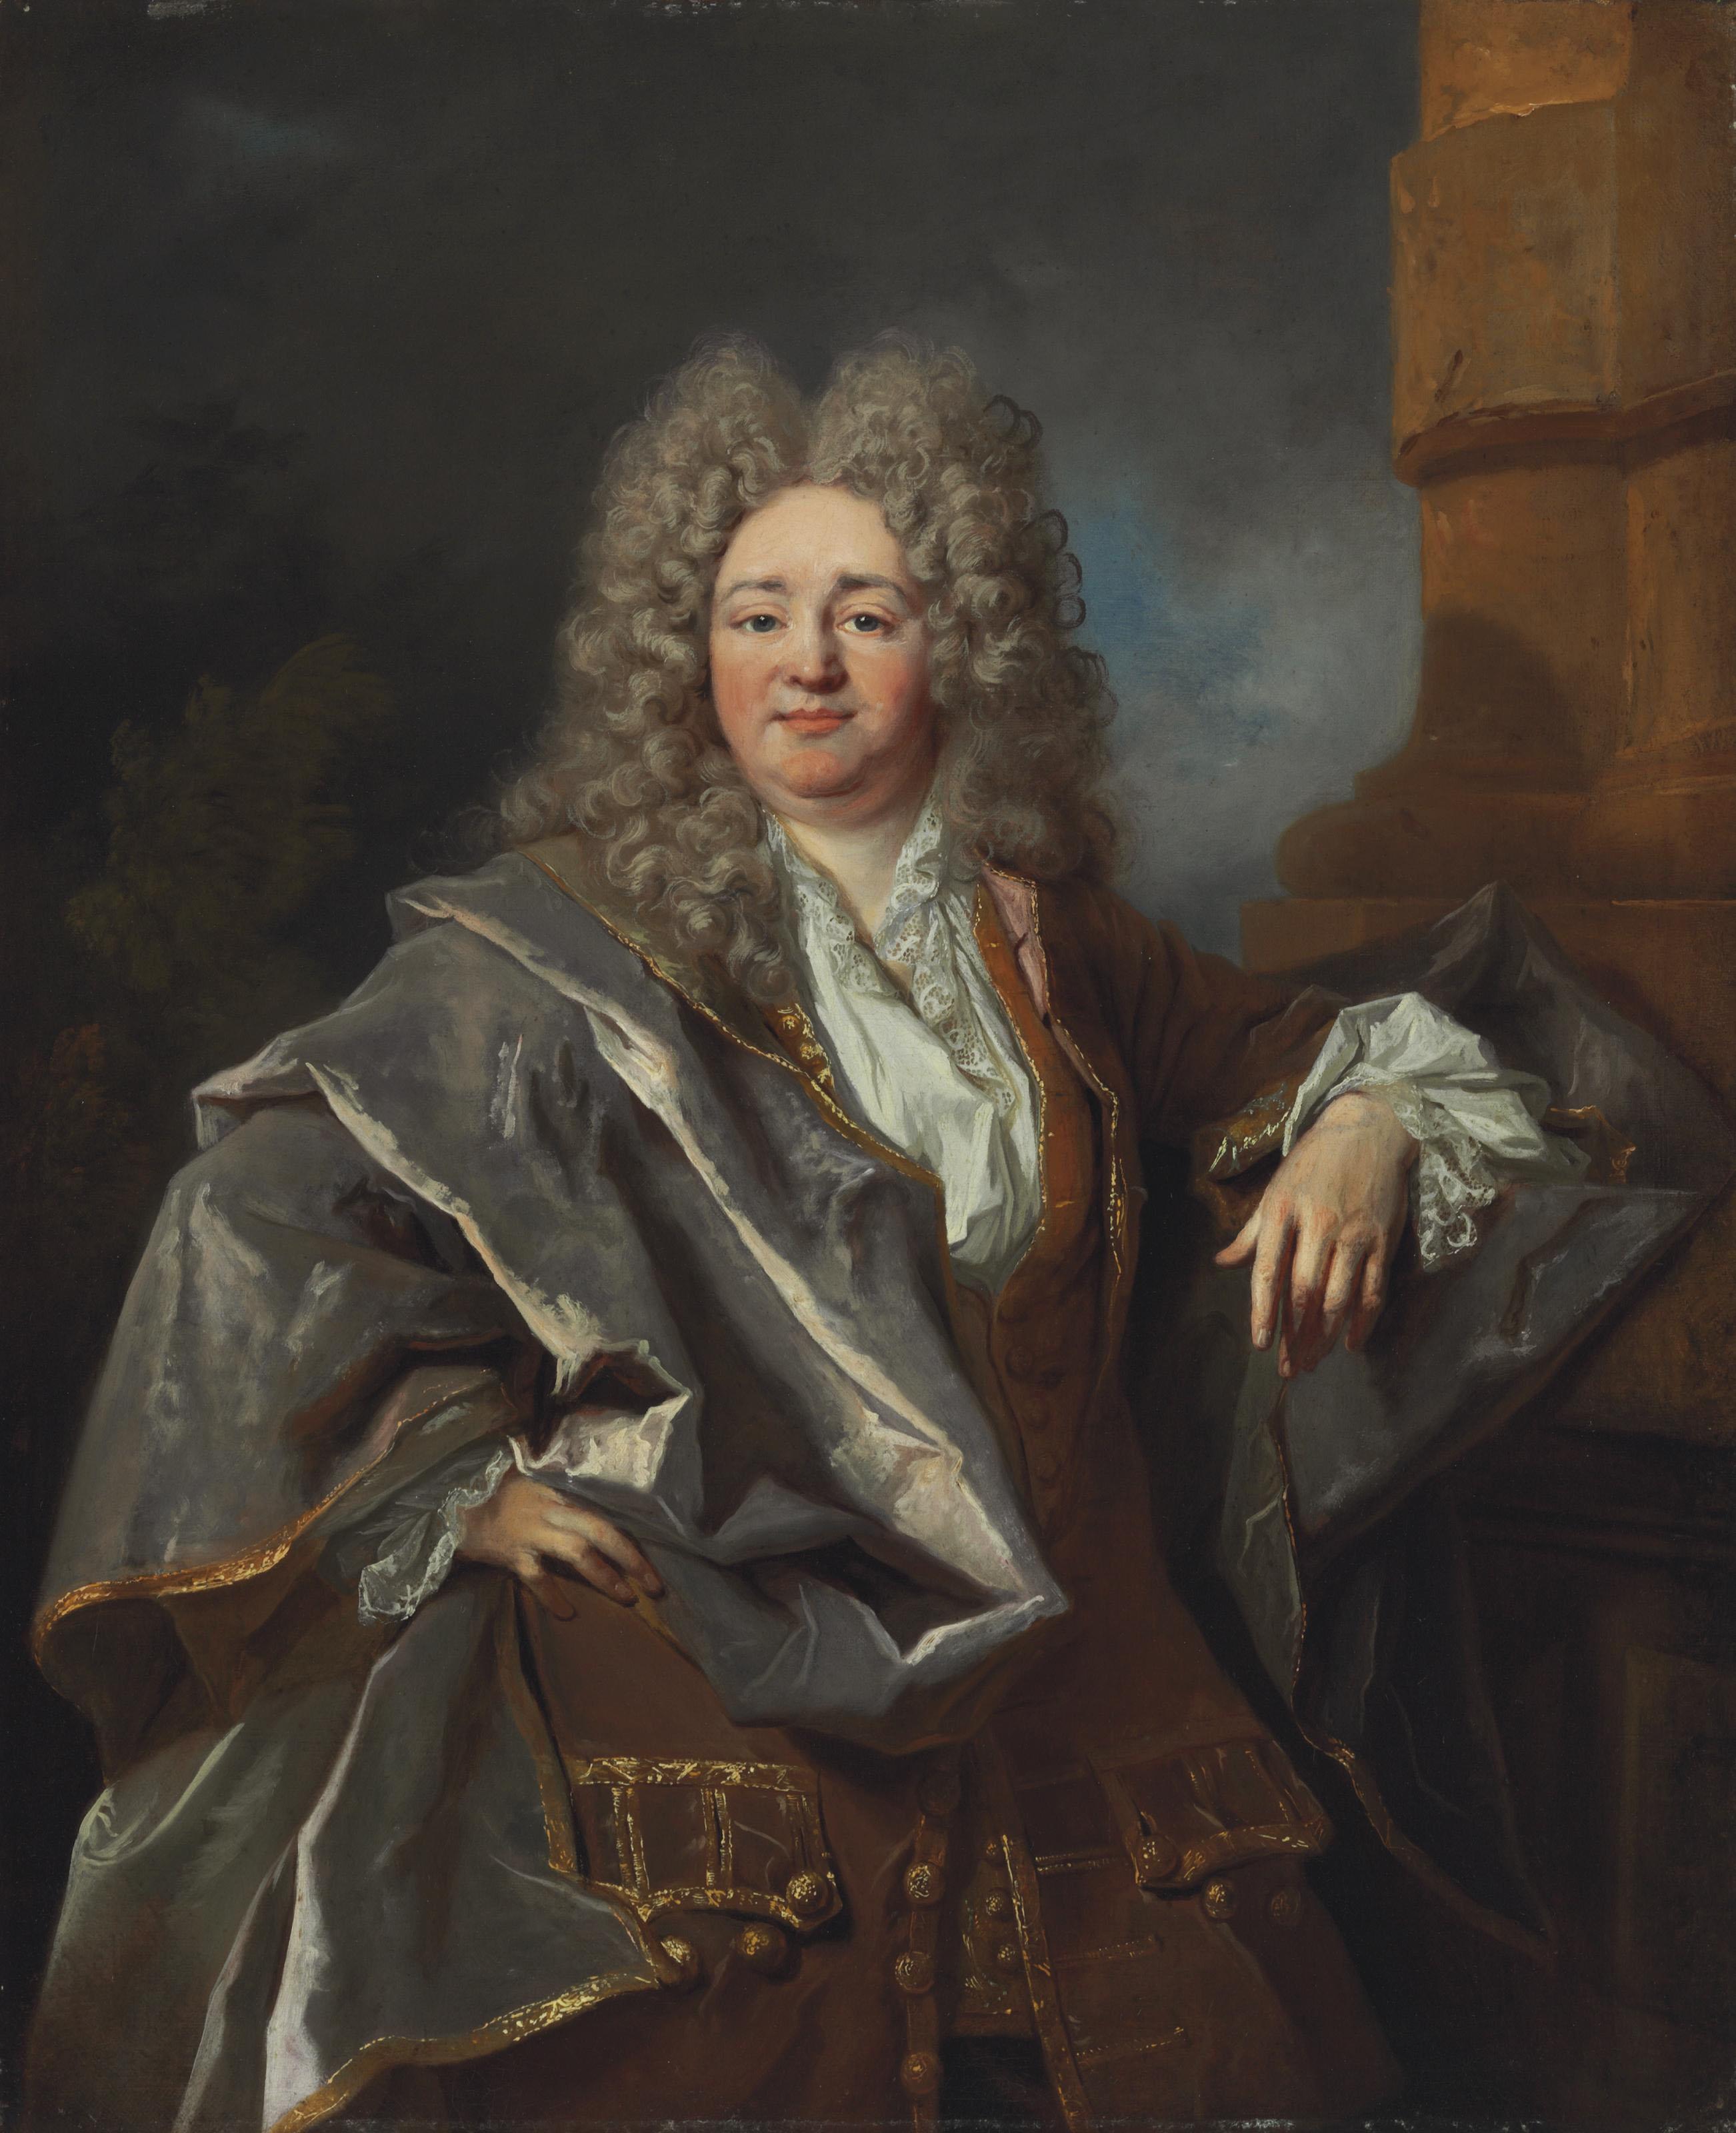 Portrait of a Gentleman, three-quarter length